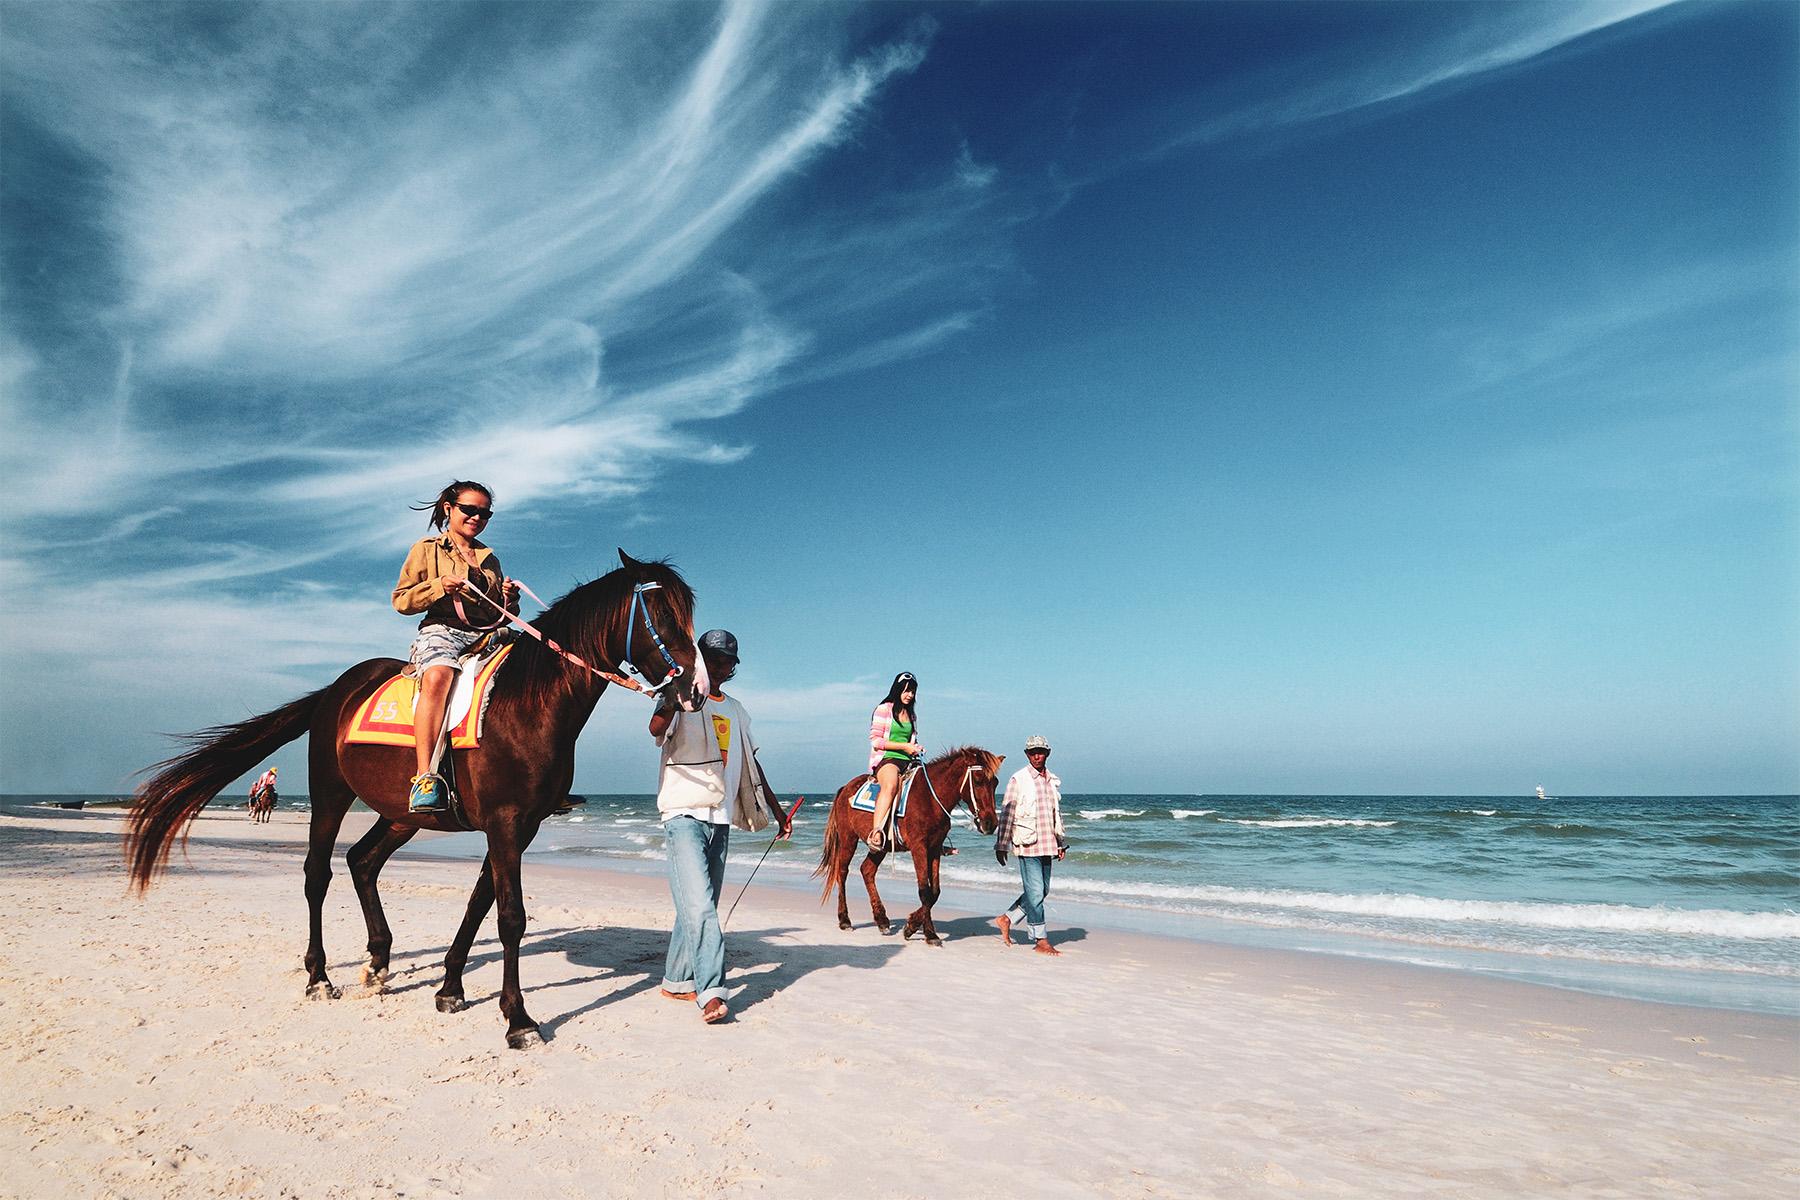 Travel Thursday: A Heritage Beach Town, Hua Hin